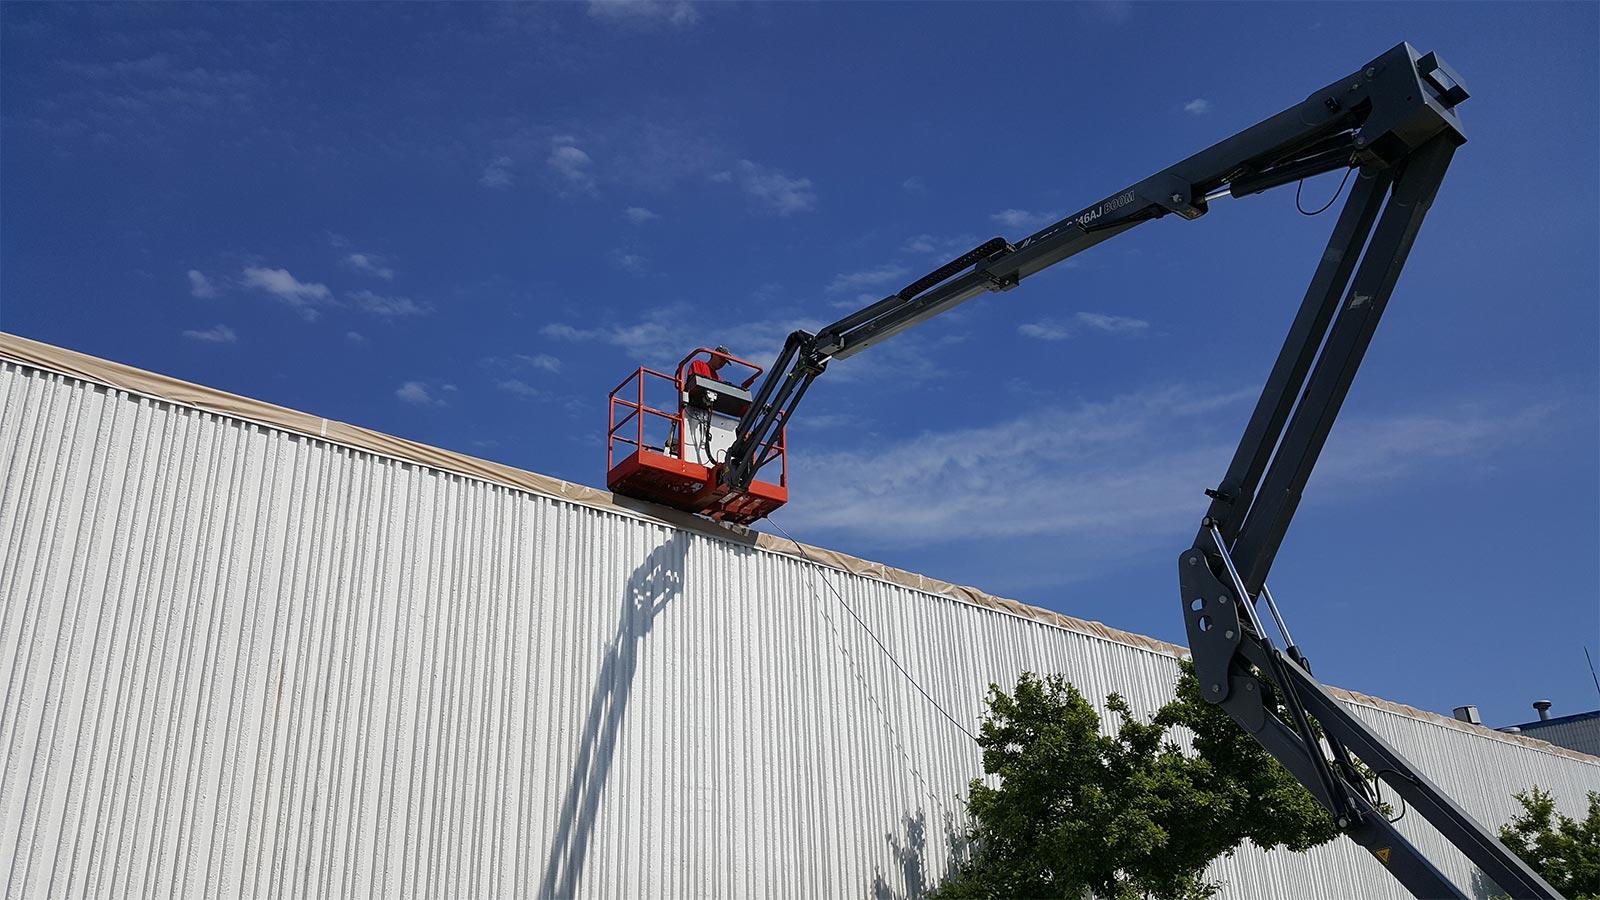 Wertz-Painting-Commercial-Exterior-Aerial-Work-Platform-Cinci-Dayton